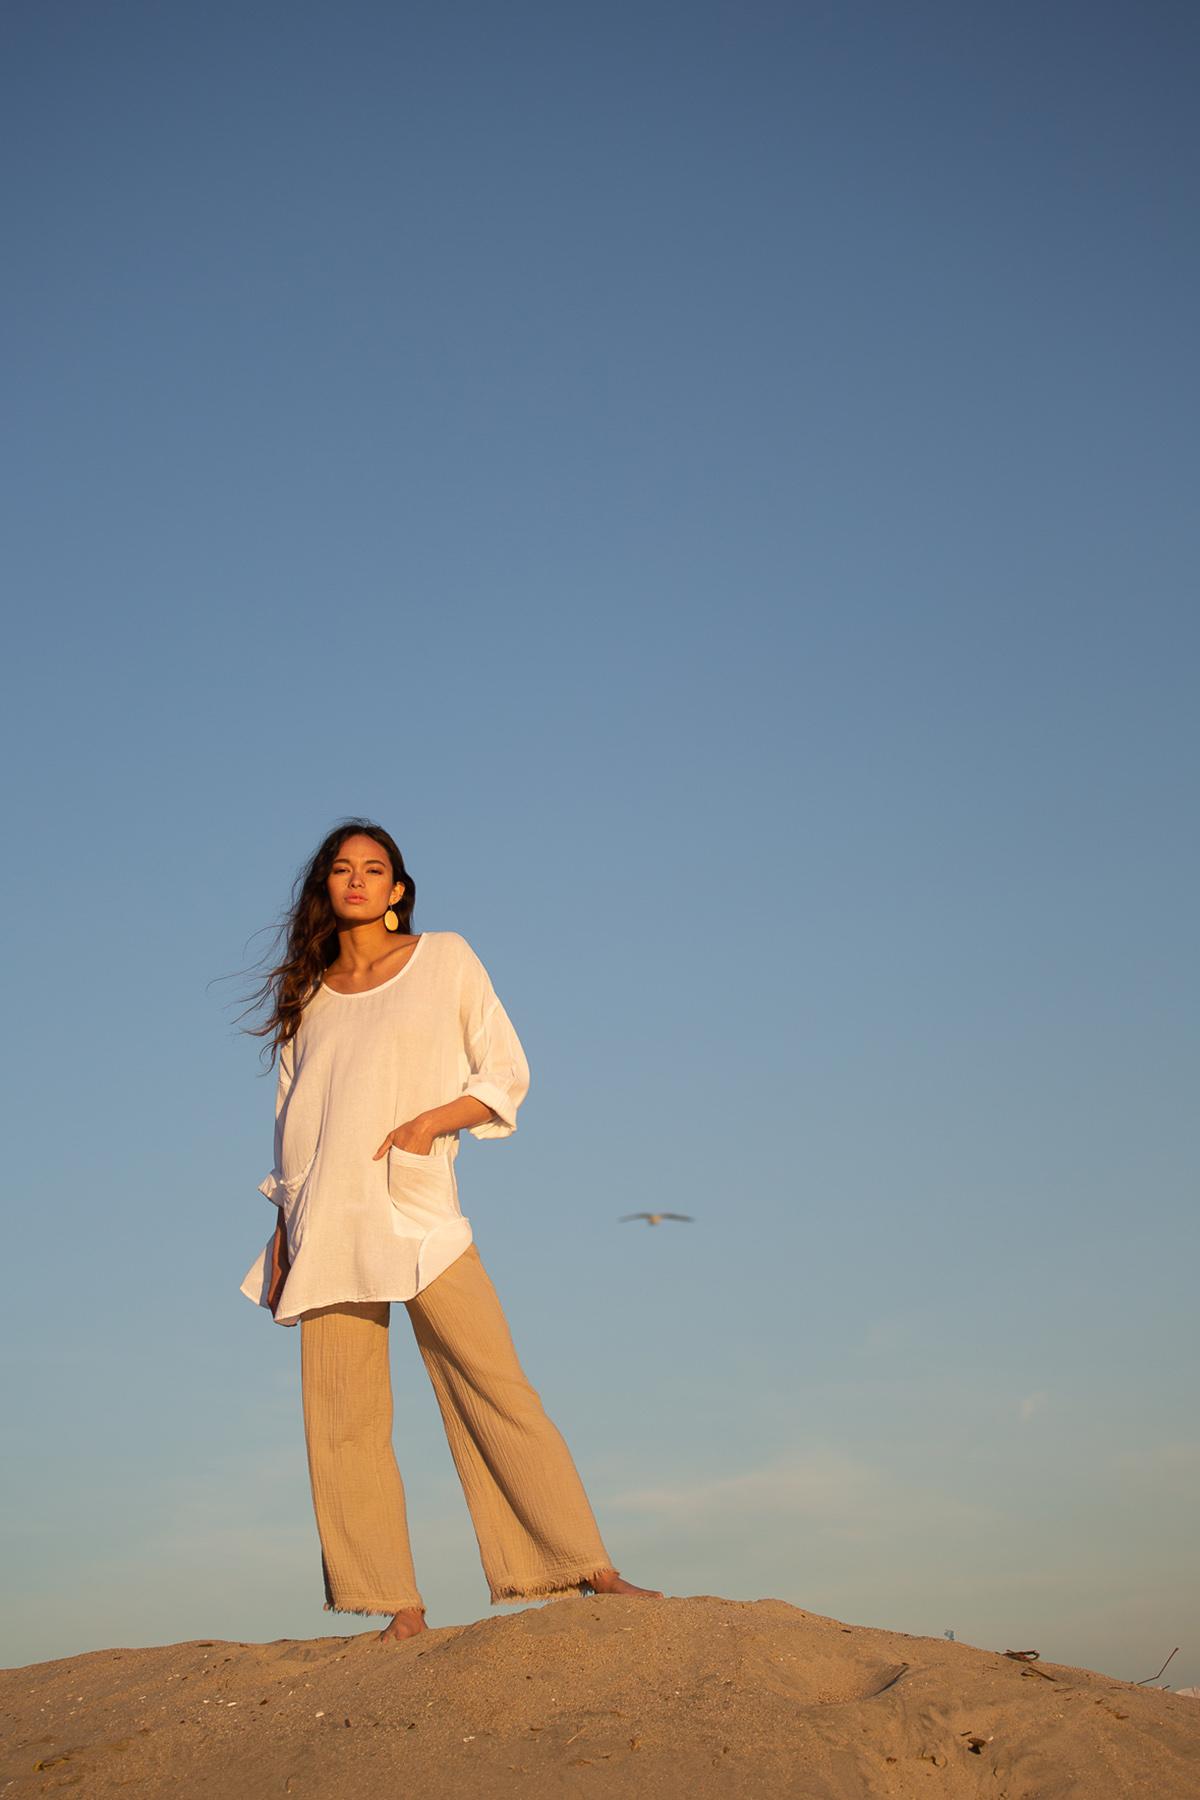 Los Angeles Bohemian Lookbook Photography by Michele LoBosco